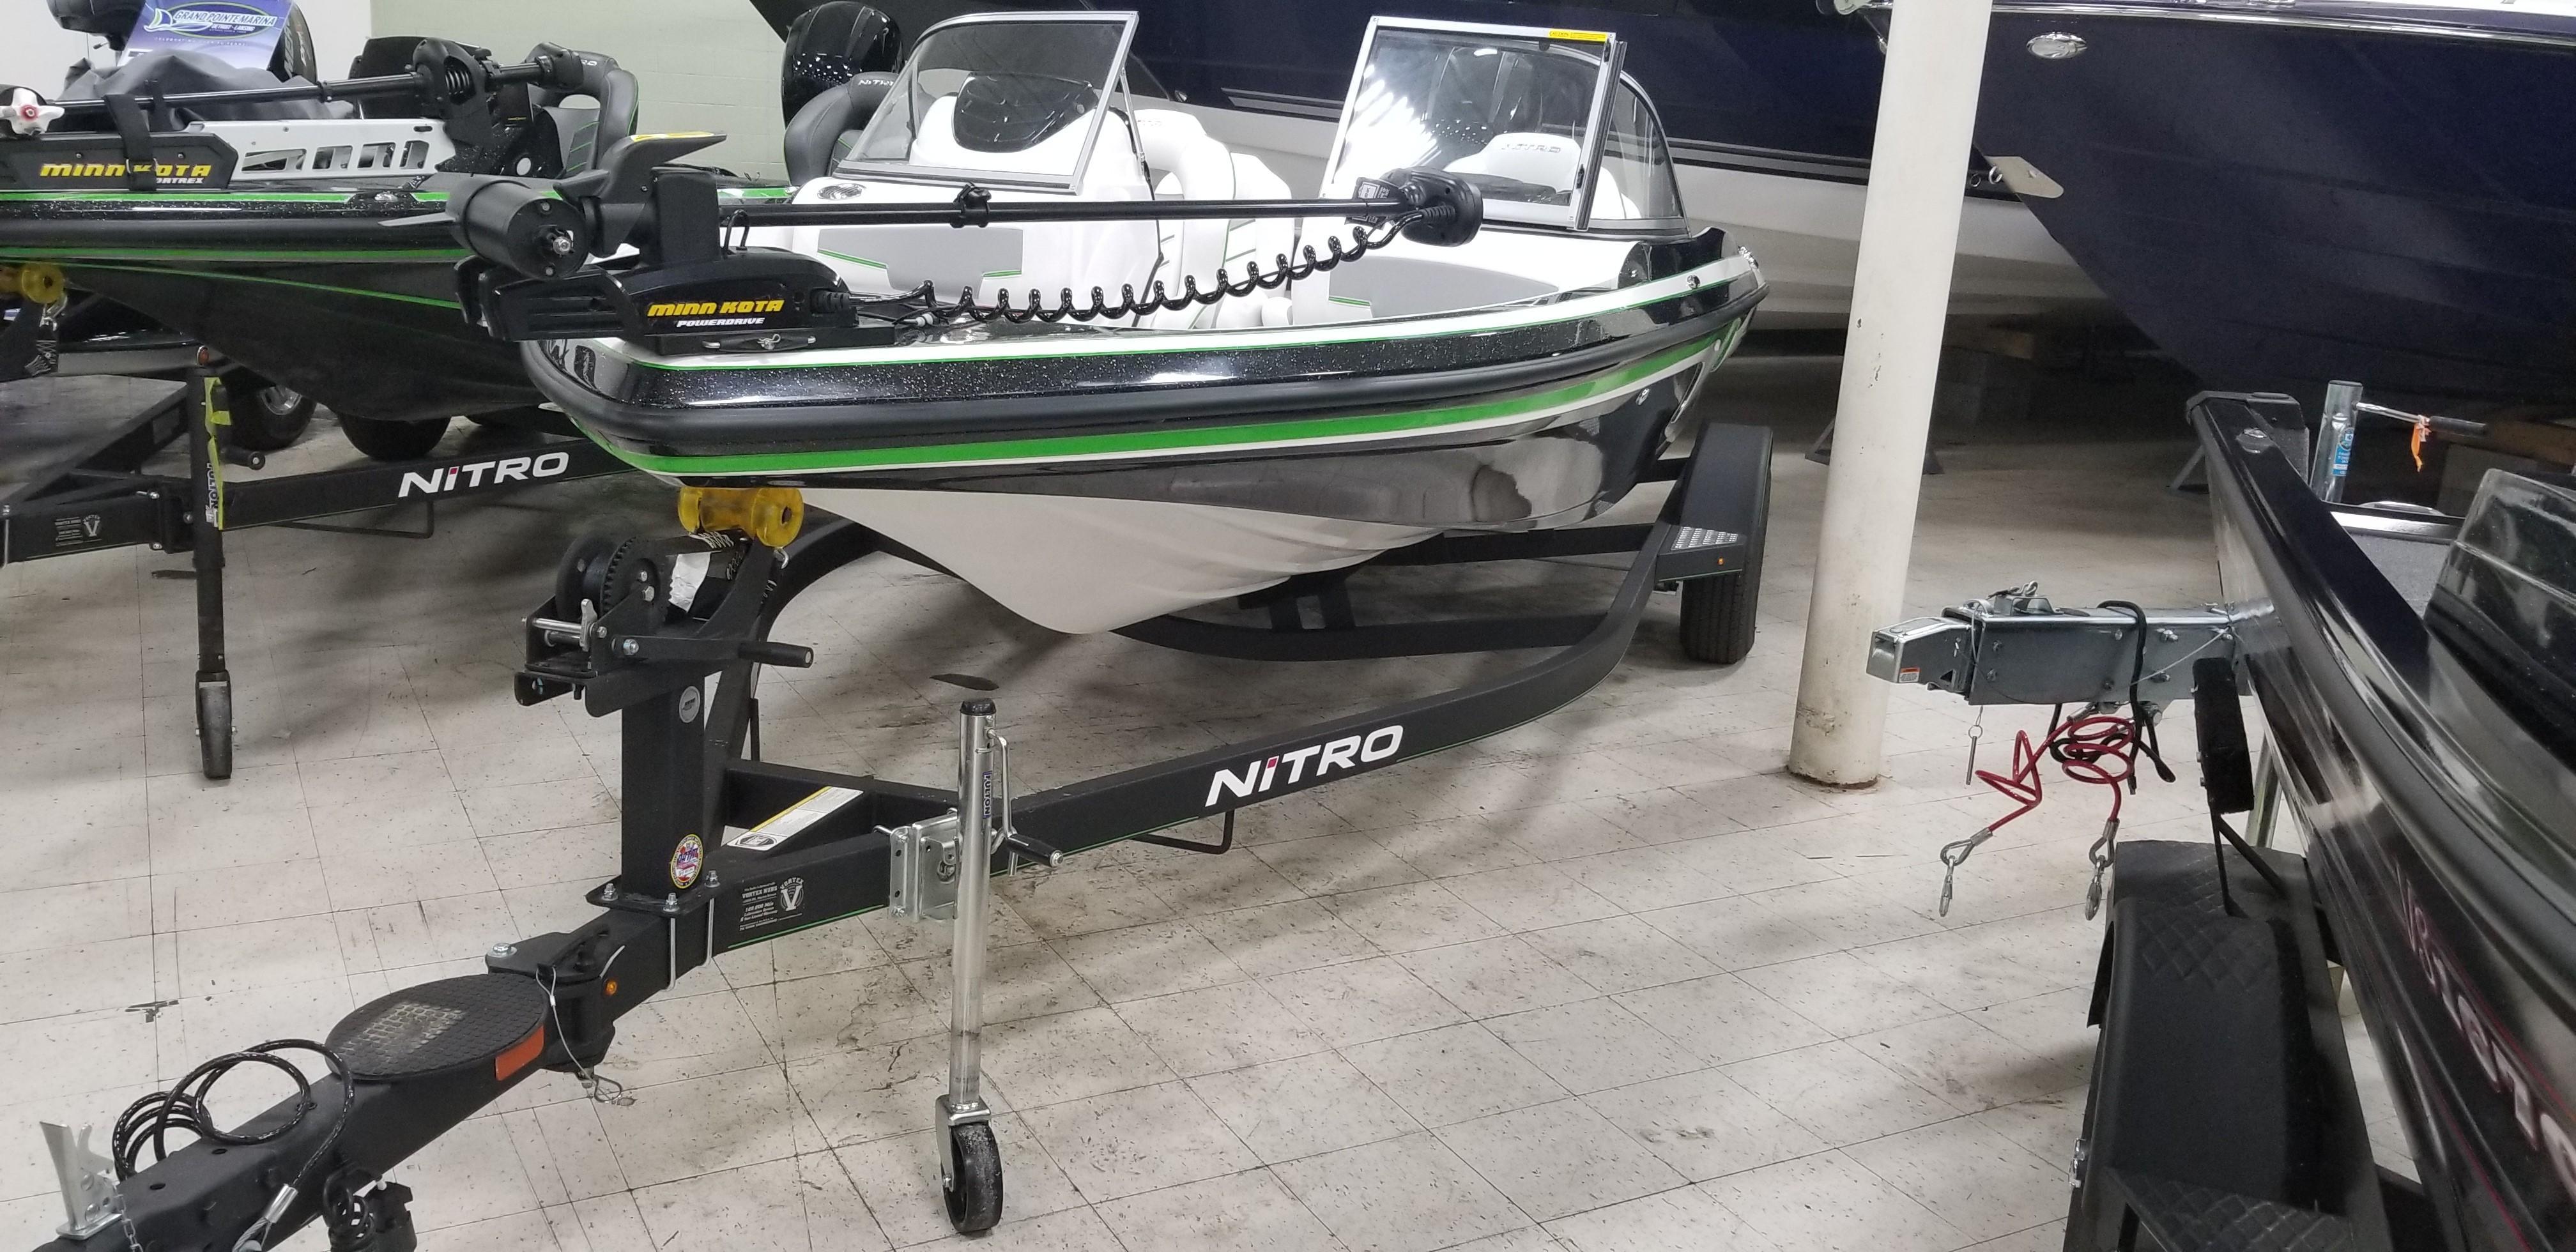 NitroZ19